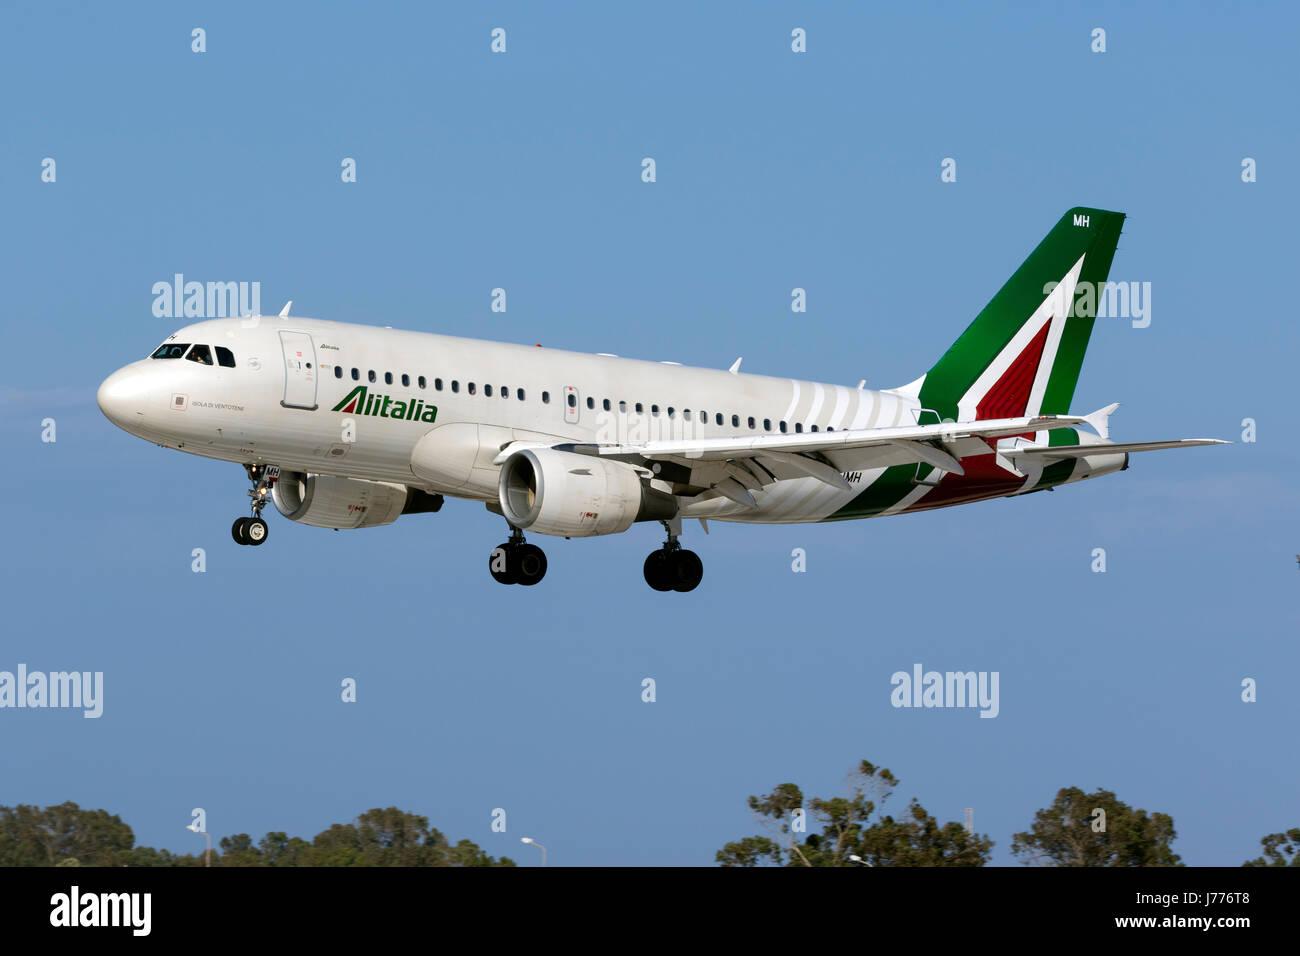 Alitalia Airbus A319-112 [EI-IMH] in der neuesten Lackierung für Alitalia Landebahn 31. Stockfoto